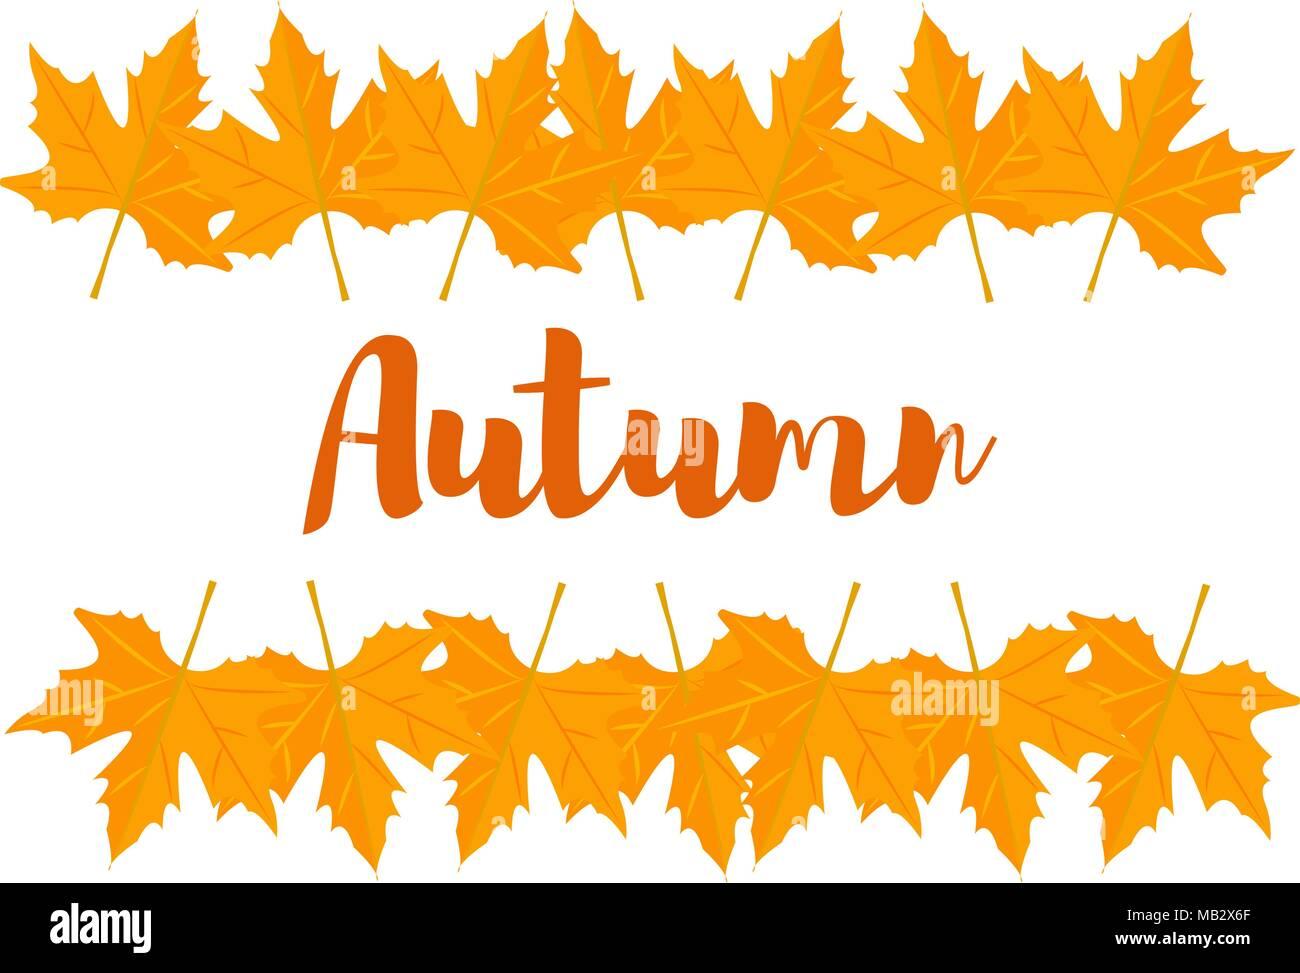 Autumn Leaves Letterhead Template Stock Photos & Autumn Leaves ...